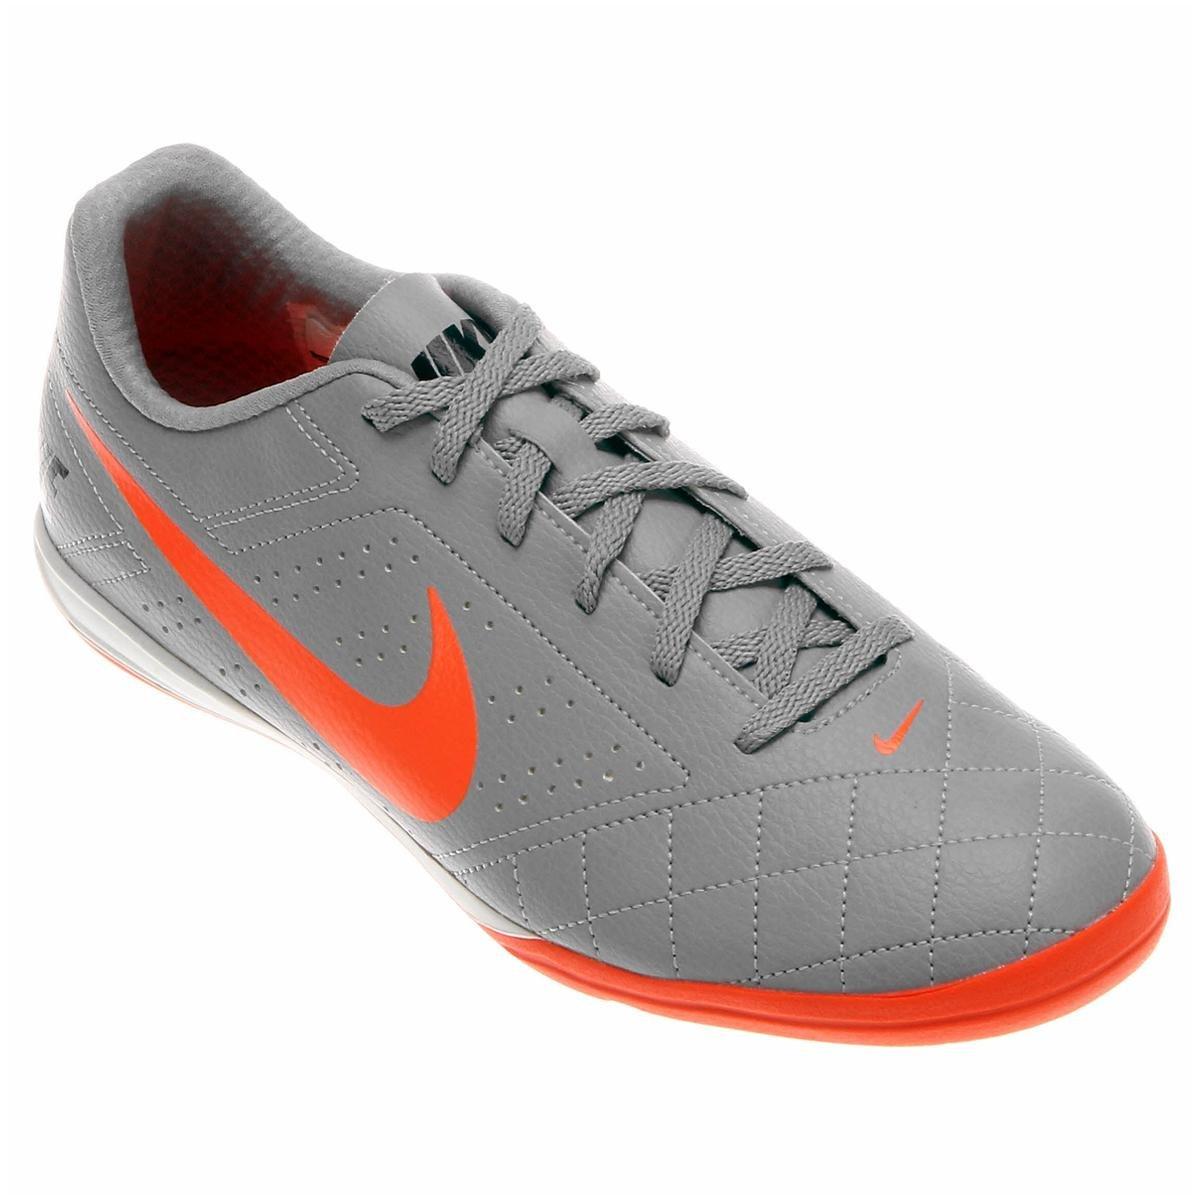 Chuteira Futsal Nike Beco 2 Futsal - Cinza e Laranja - Compre Agora ... 5e0f73ac27c58